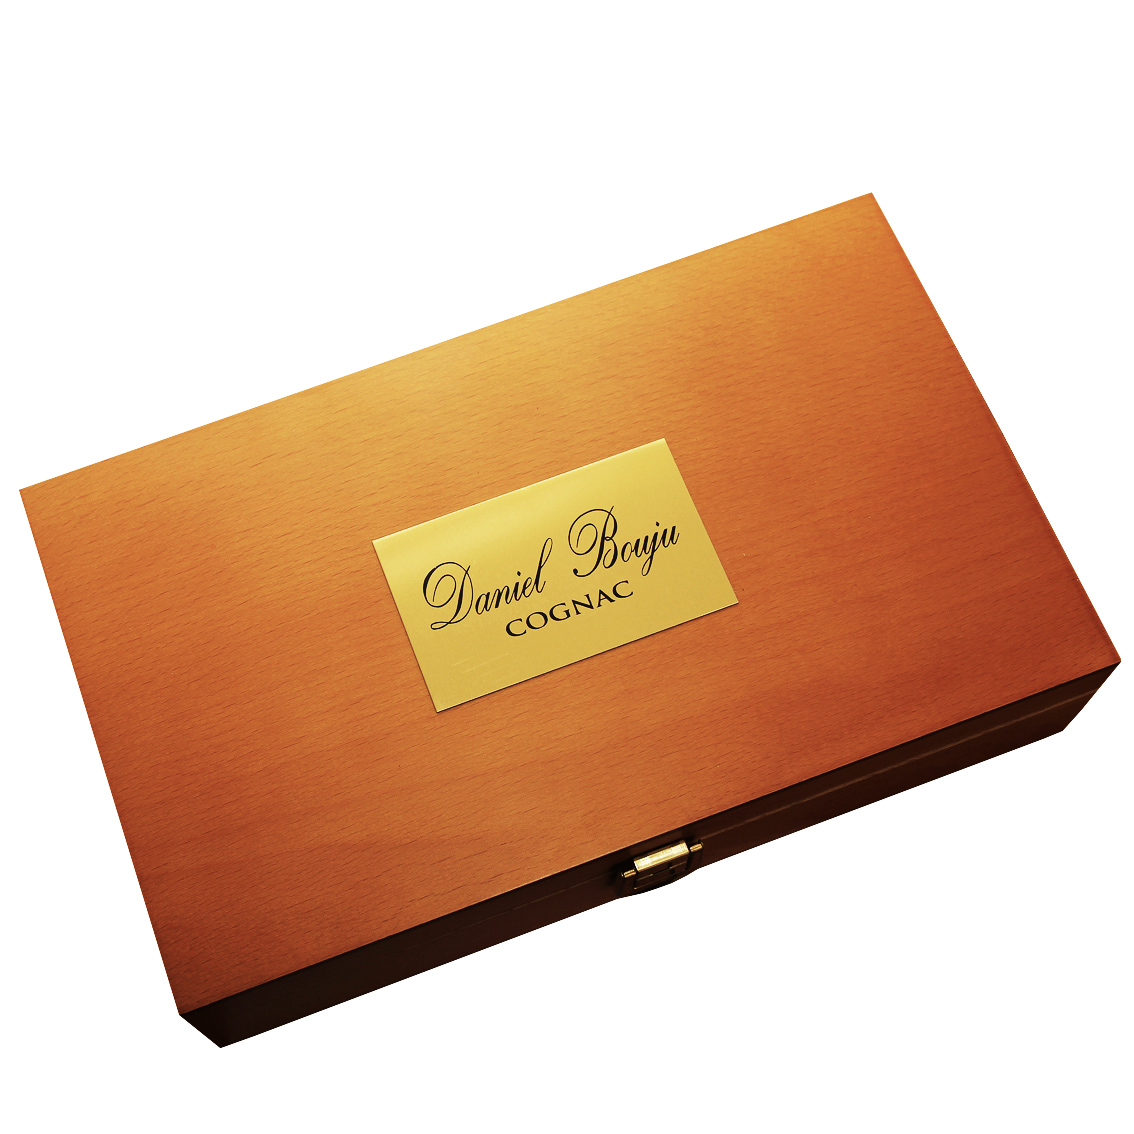 COGNAC-DANIEL-BOUJU-BOX